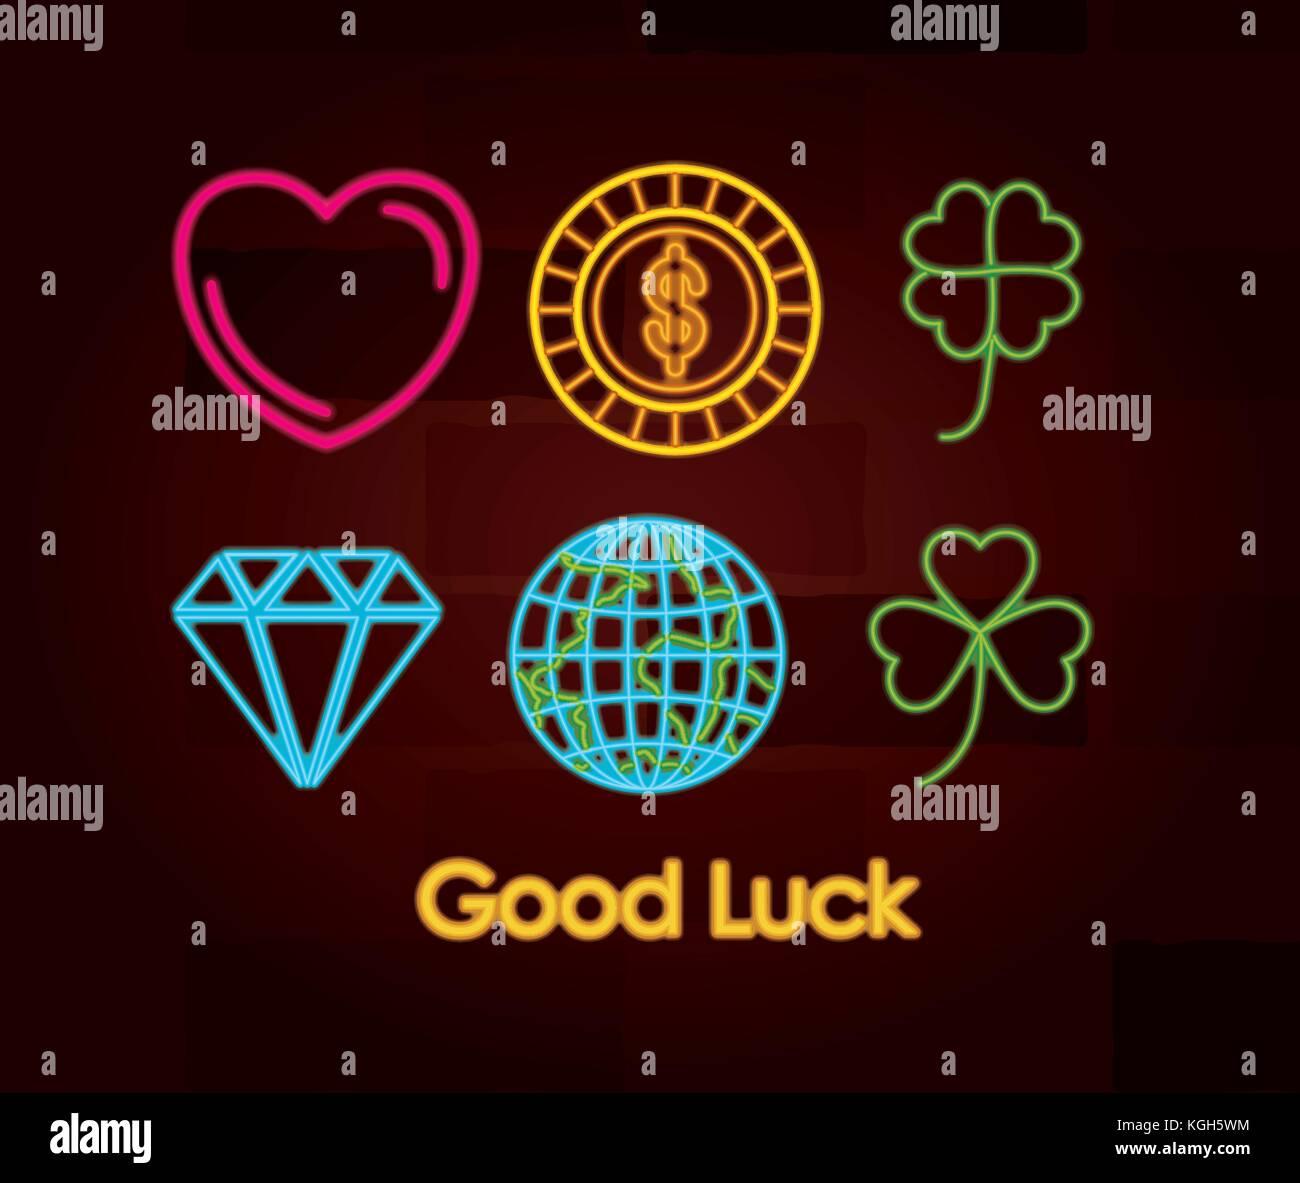 Good luck symbols stock photos good luck symbols stock images good luck symbols set of neon sign on brick wall stock image biocorpaavc